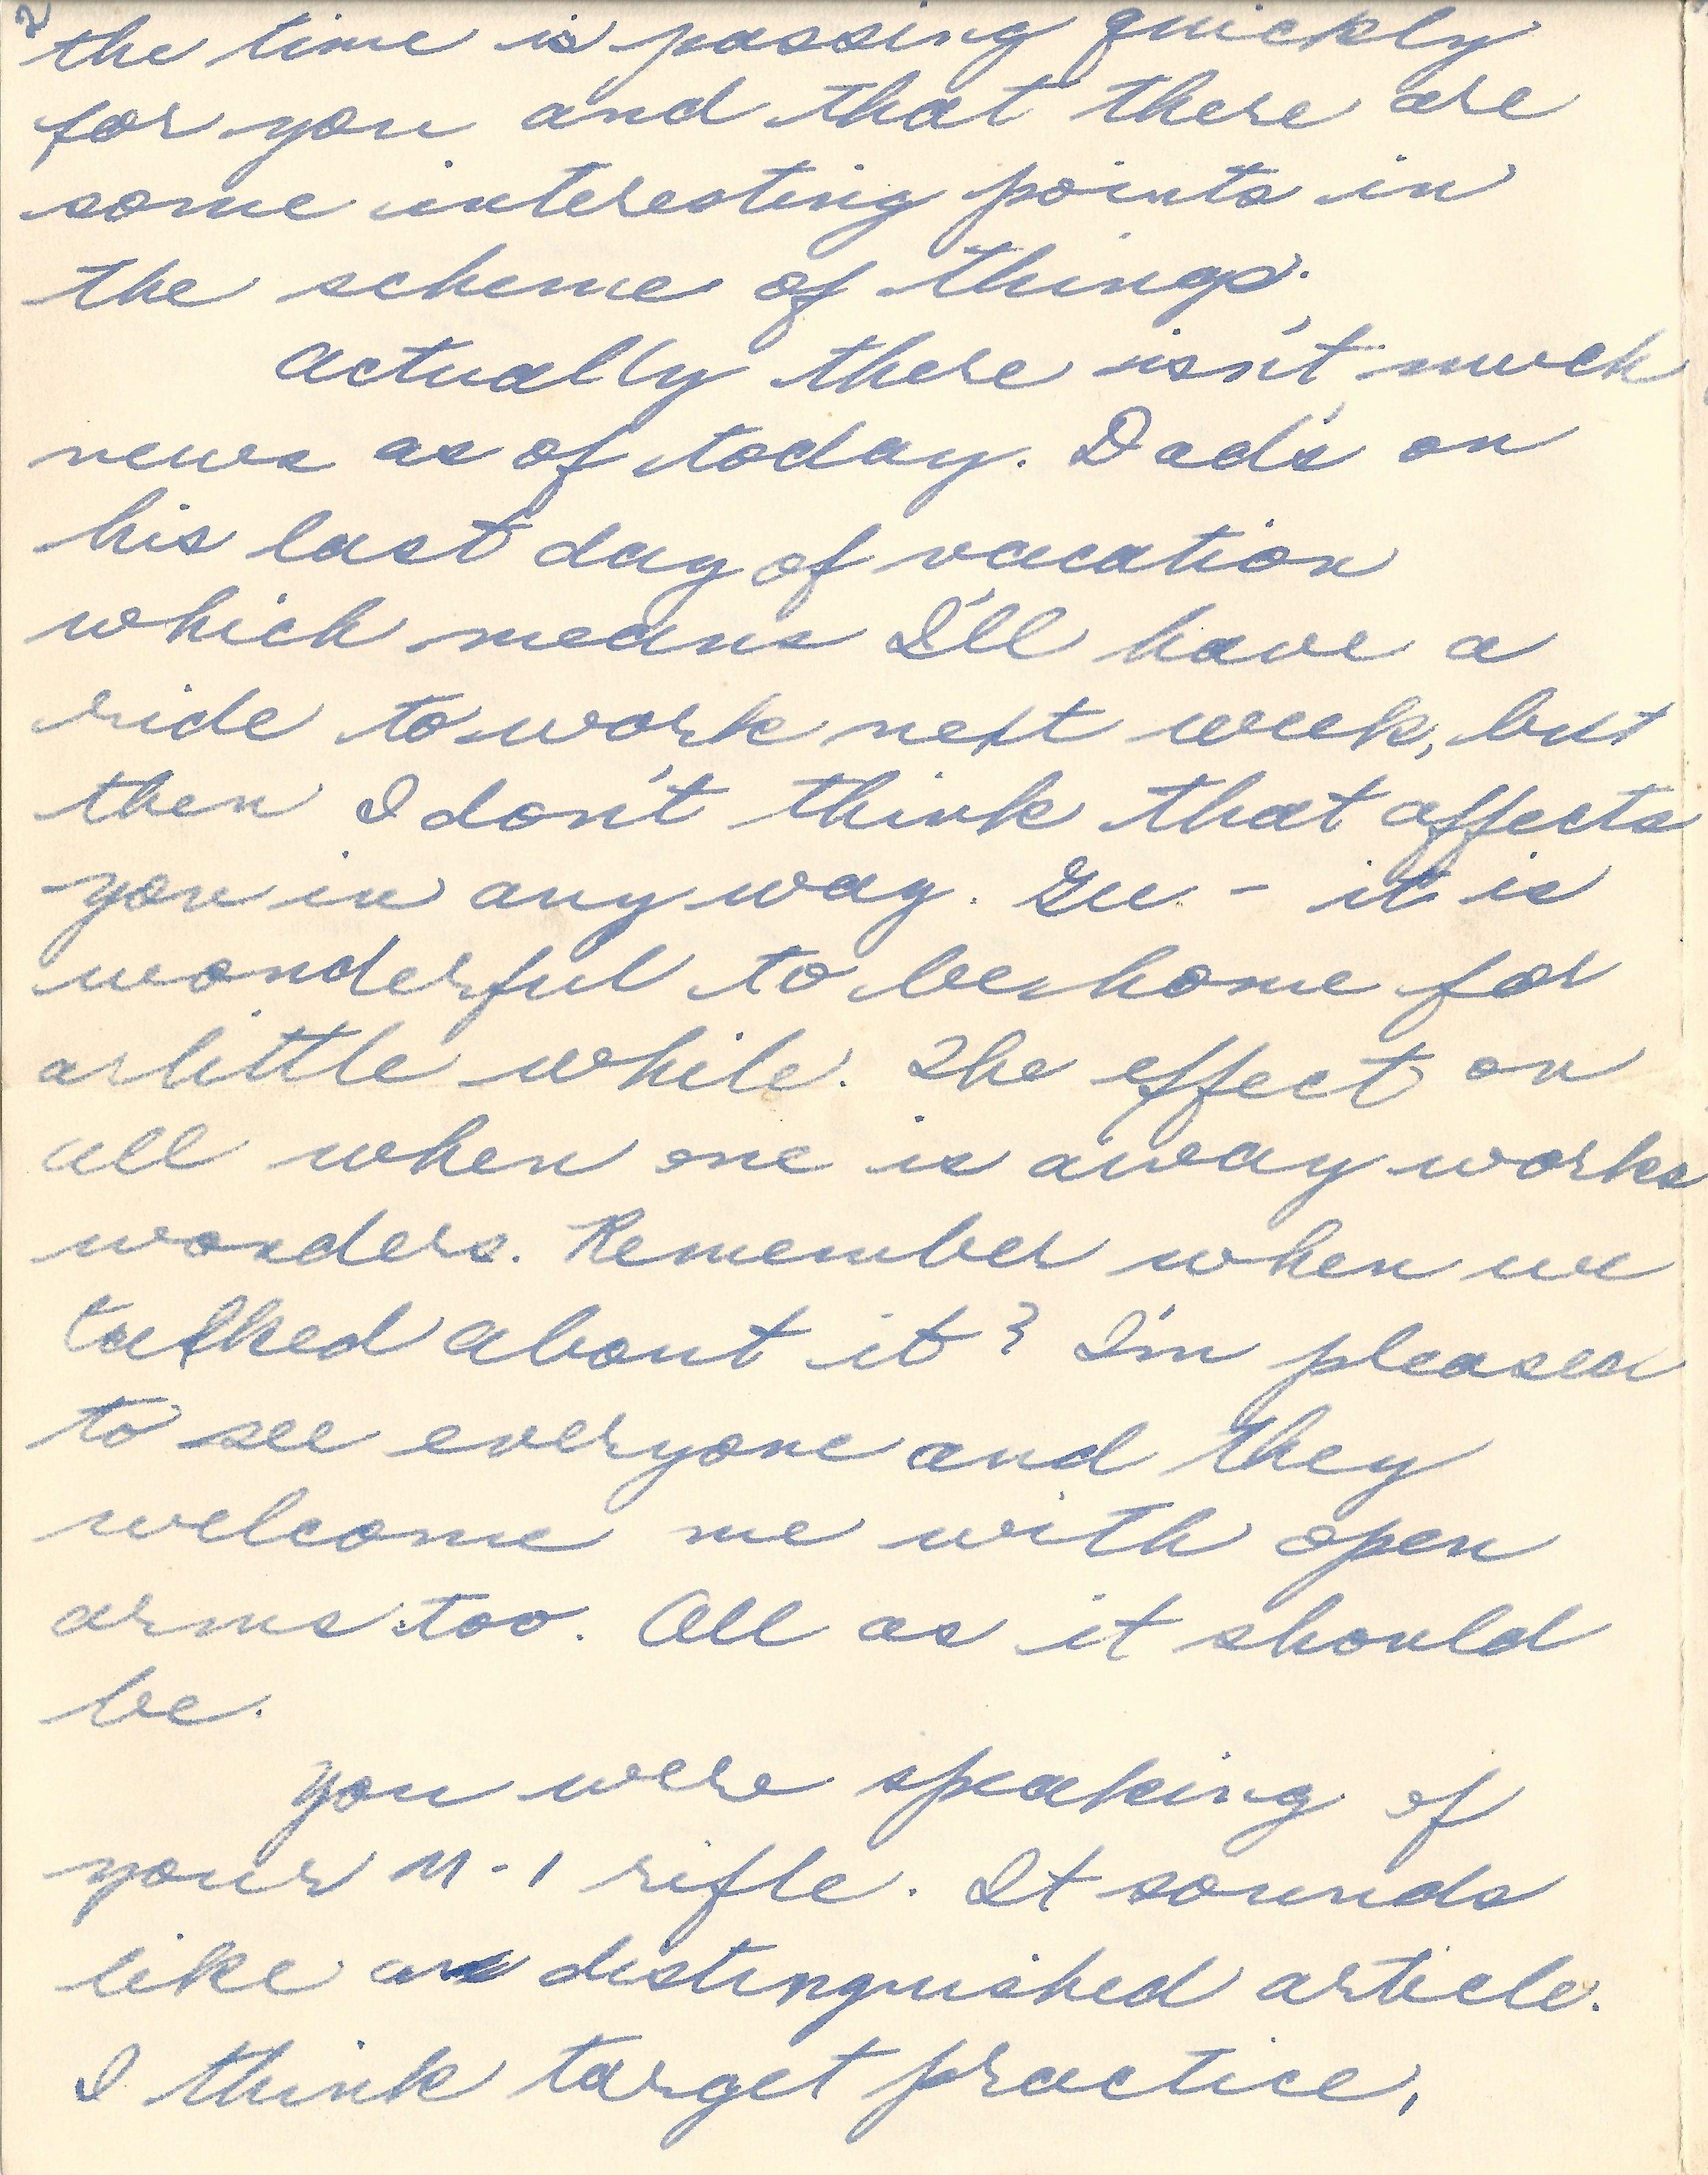 1. Nov. 2, 1952 (Oma)_Page_3 (1).jpg